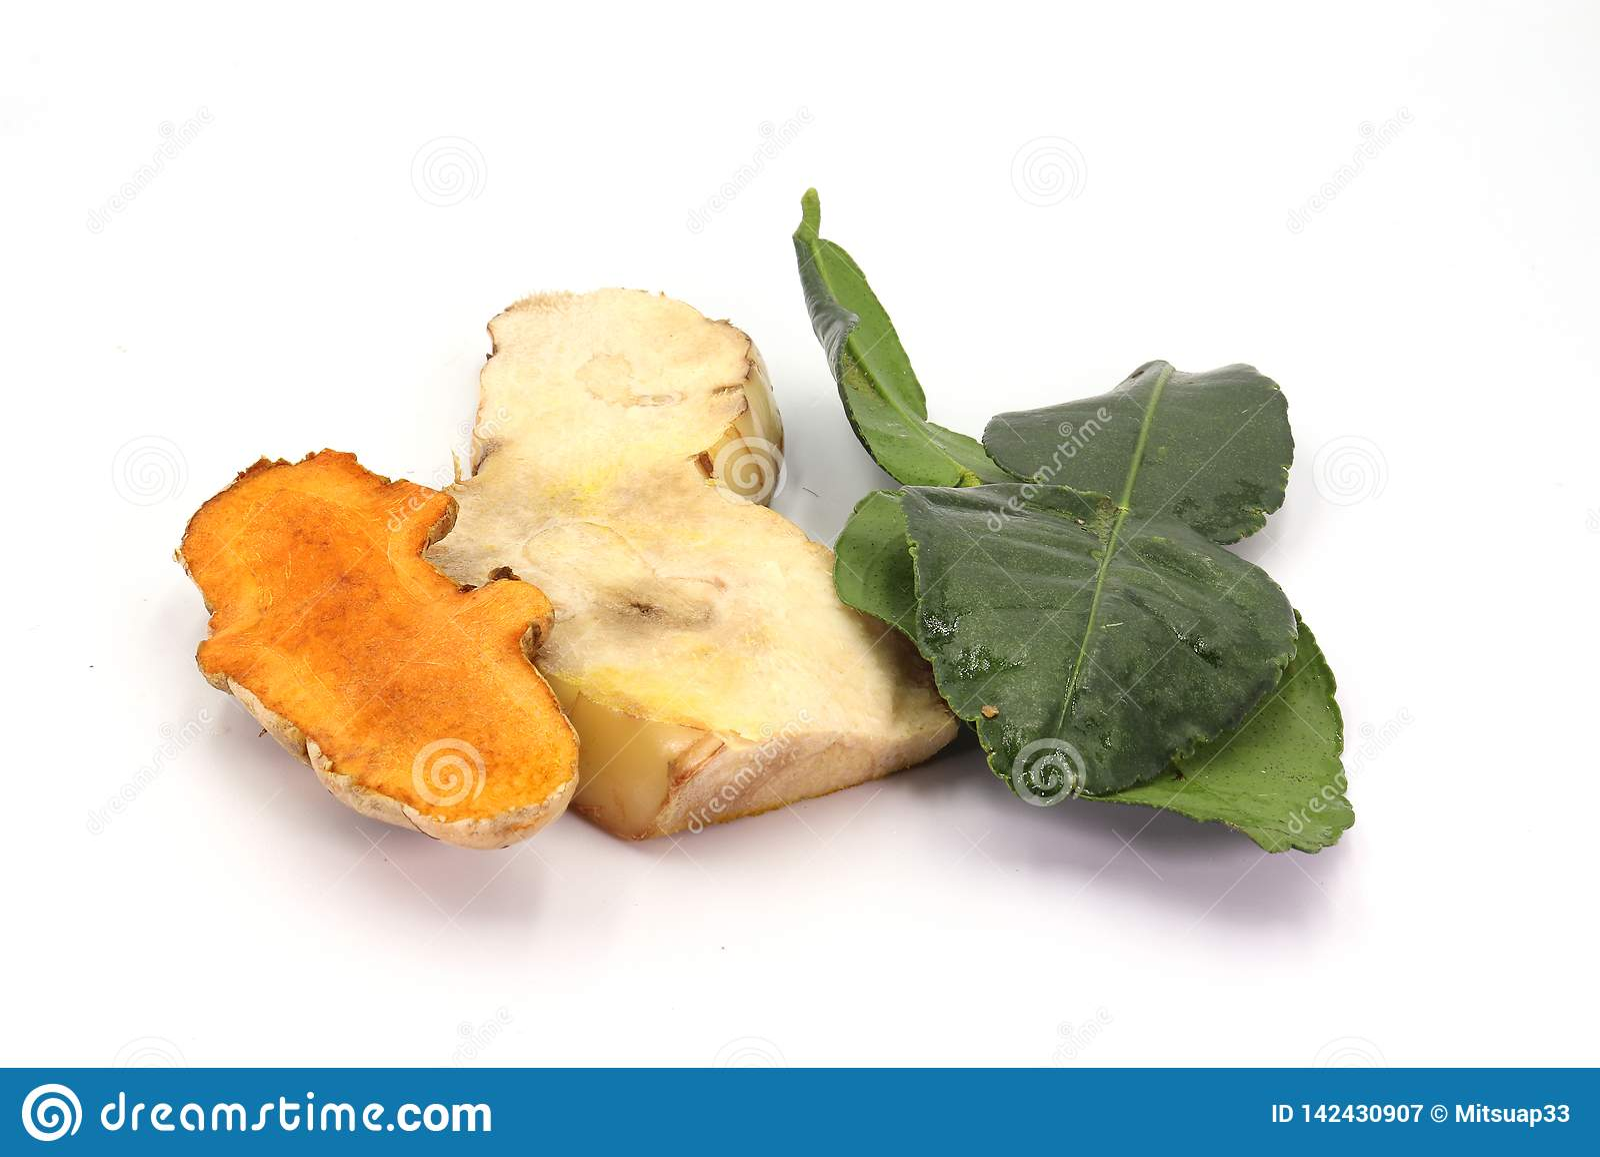 Bergamot leaf is Herbs isolated on white background